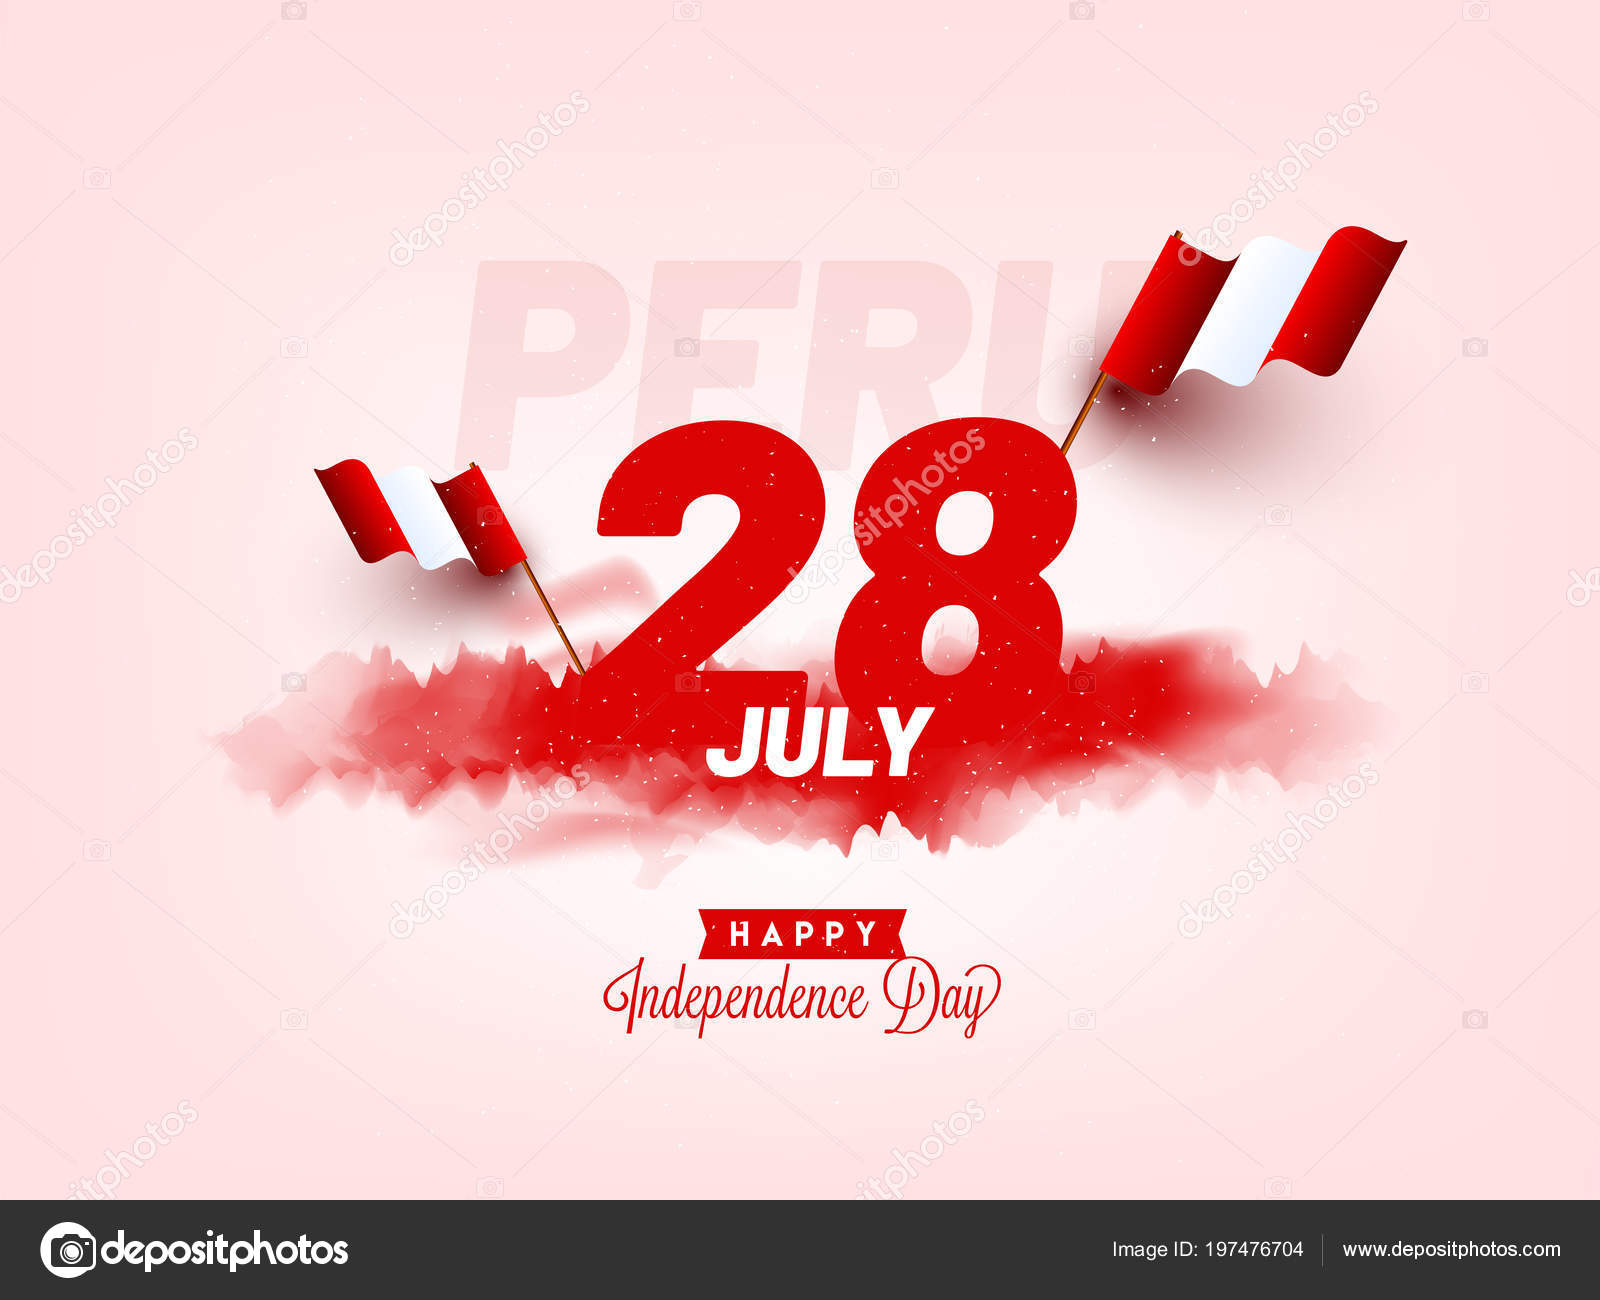 Independence Day Peru Celebration Background Stock Vector C Alliesinteract 197476704